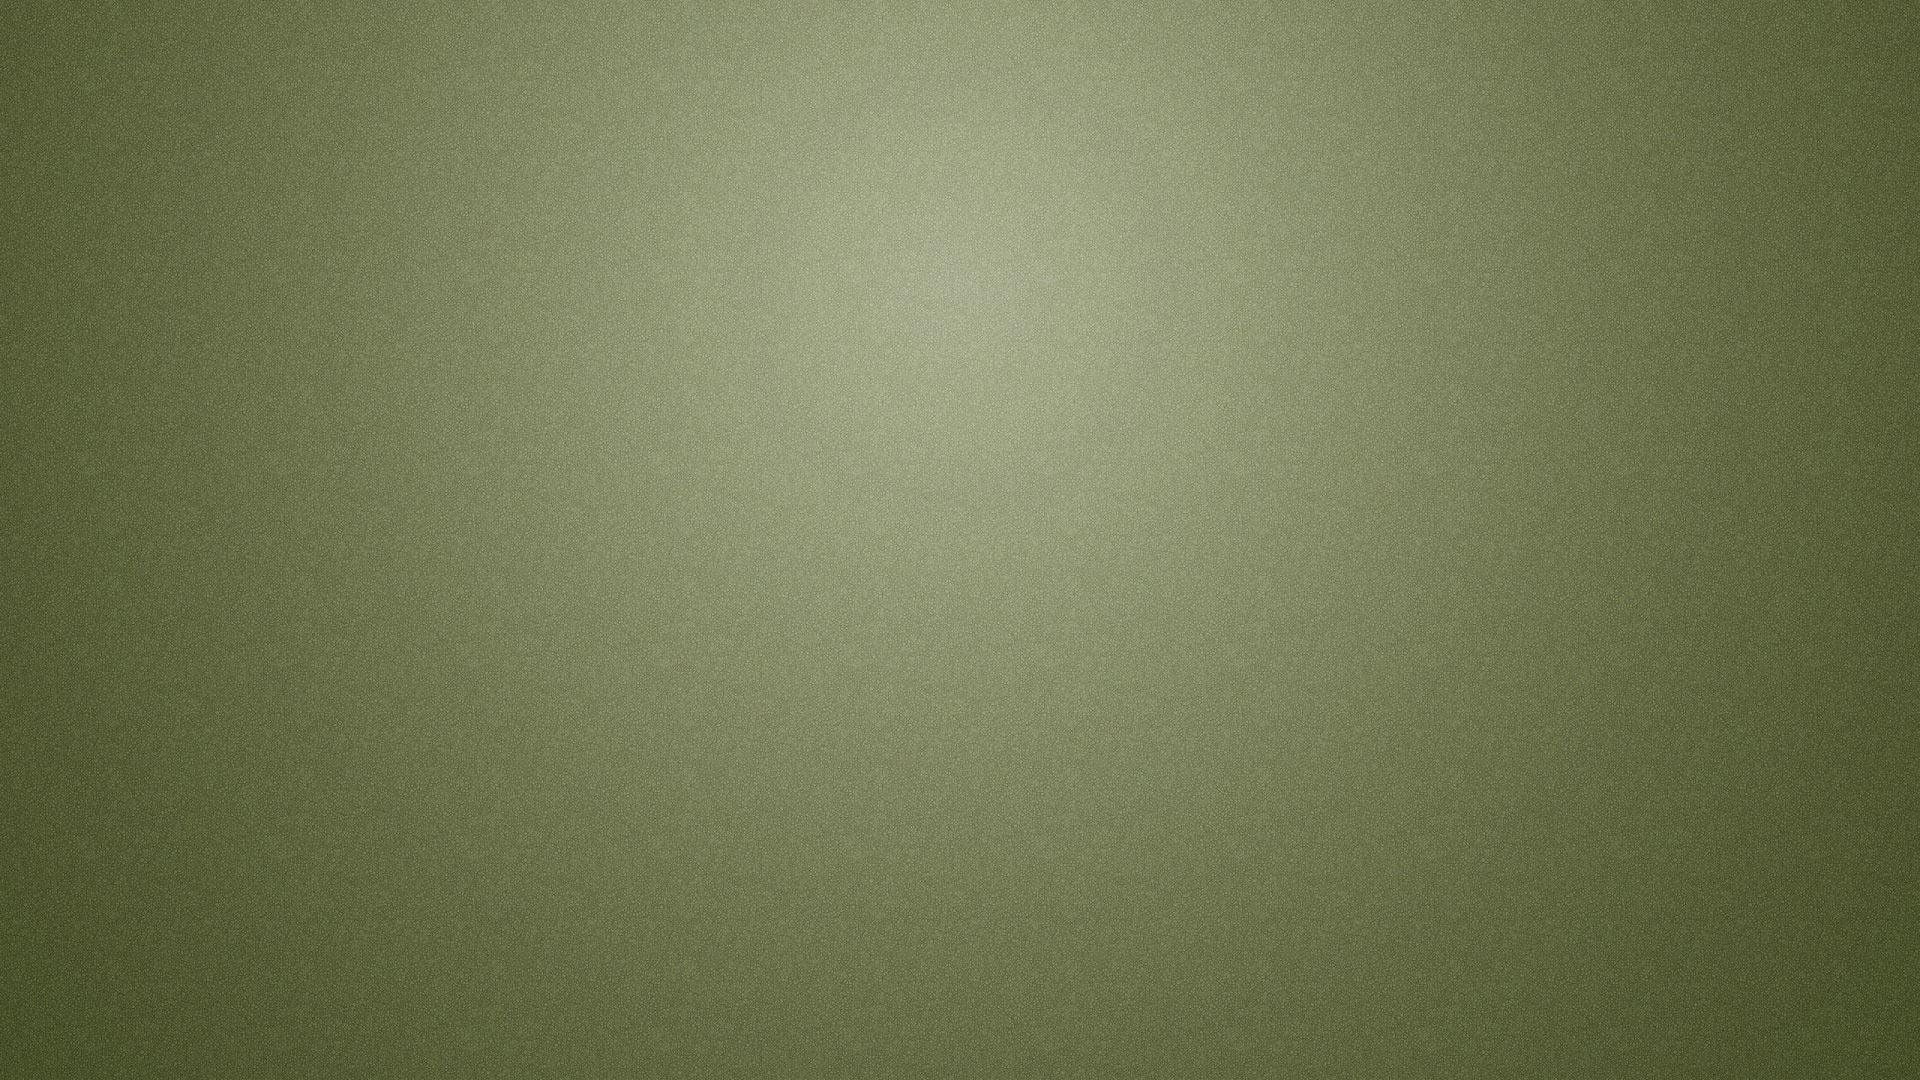 Olive Green Background